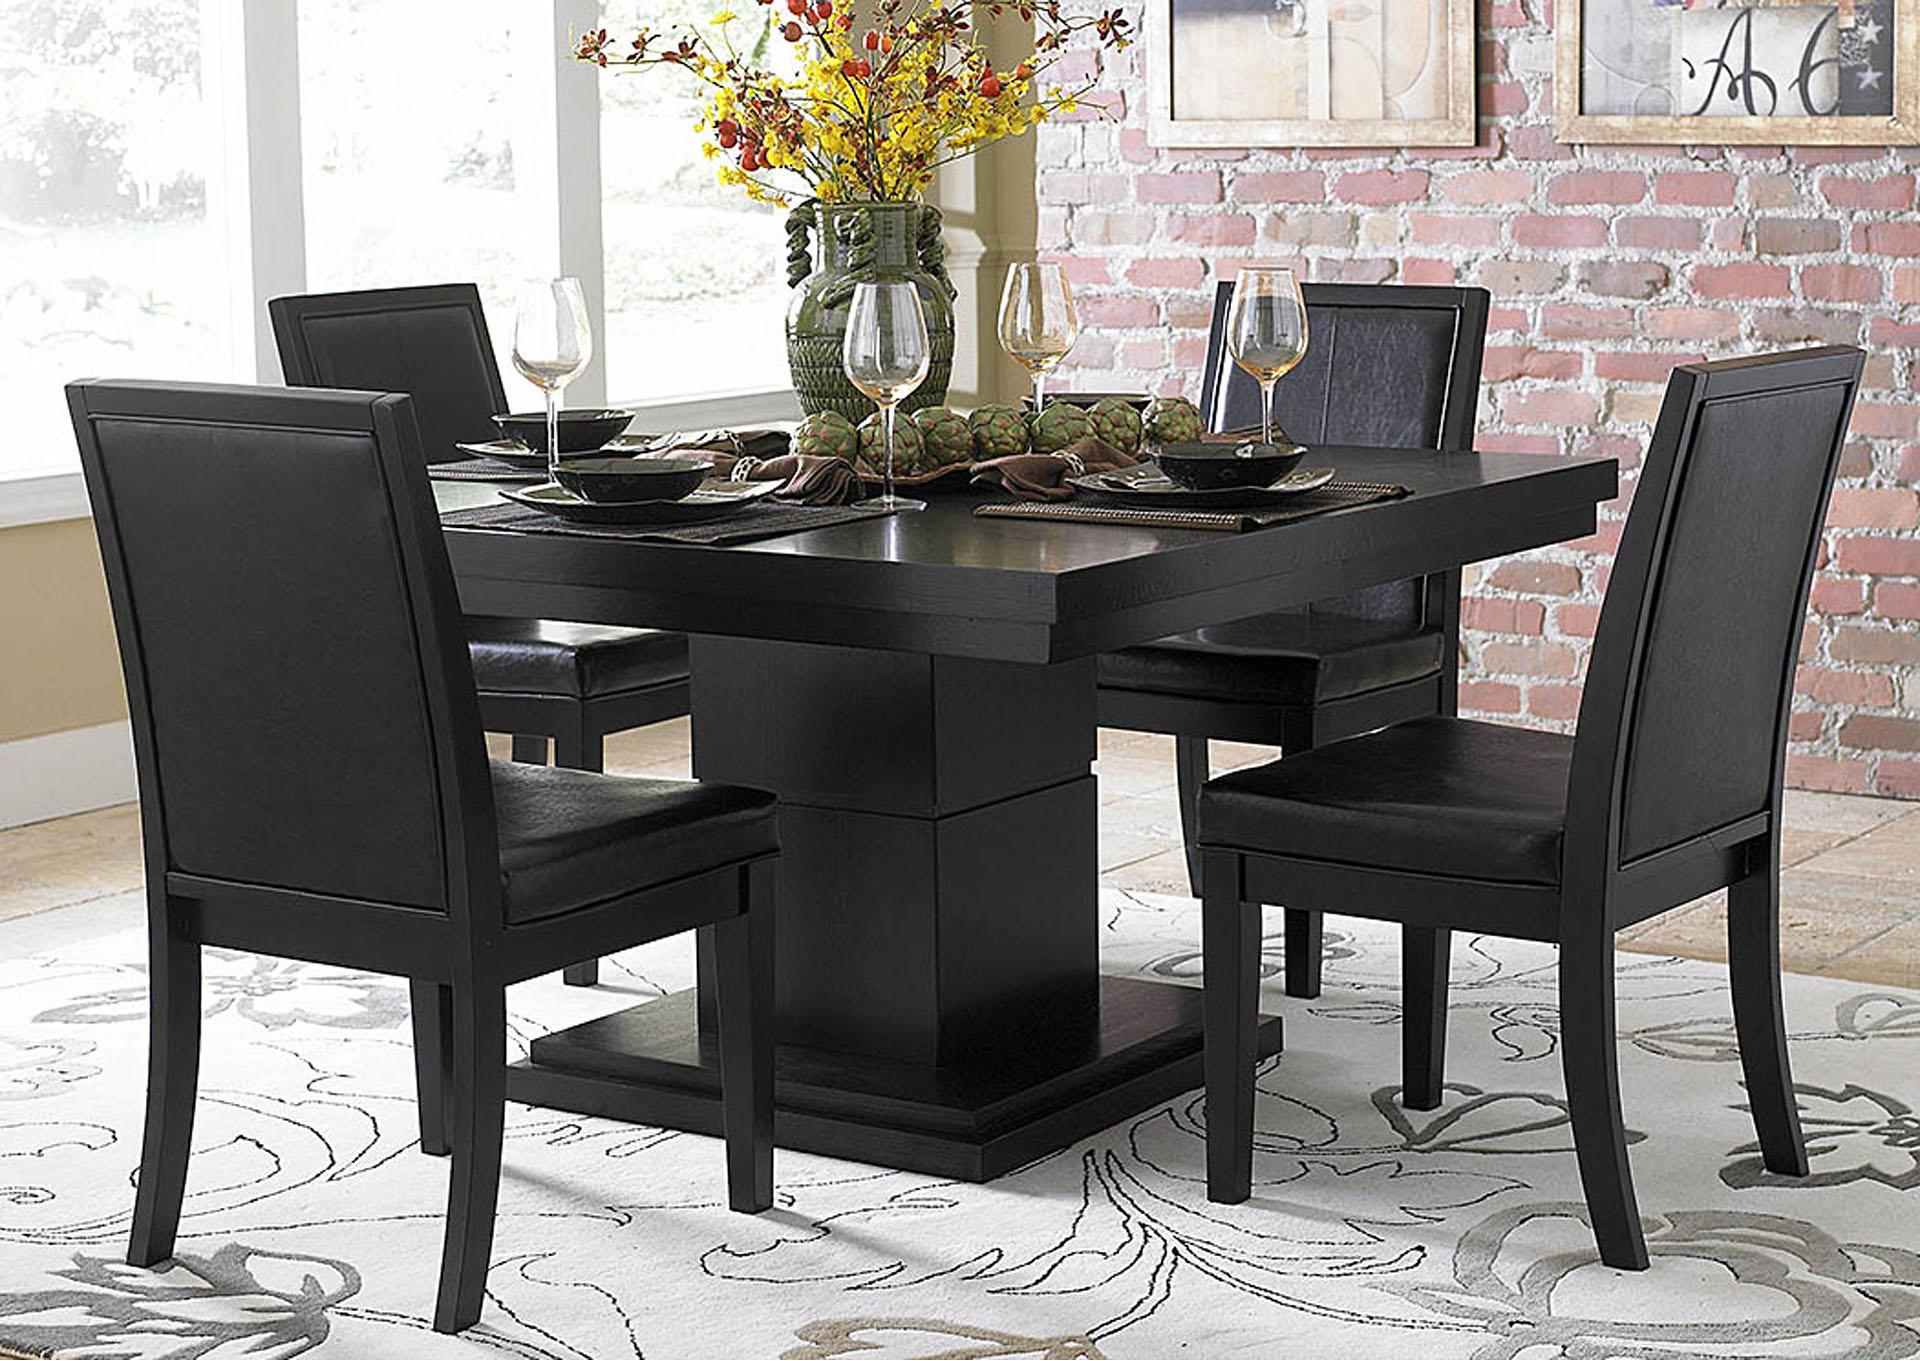 Central Furniture Mart Cicero 54 Black Dining Table W